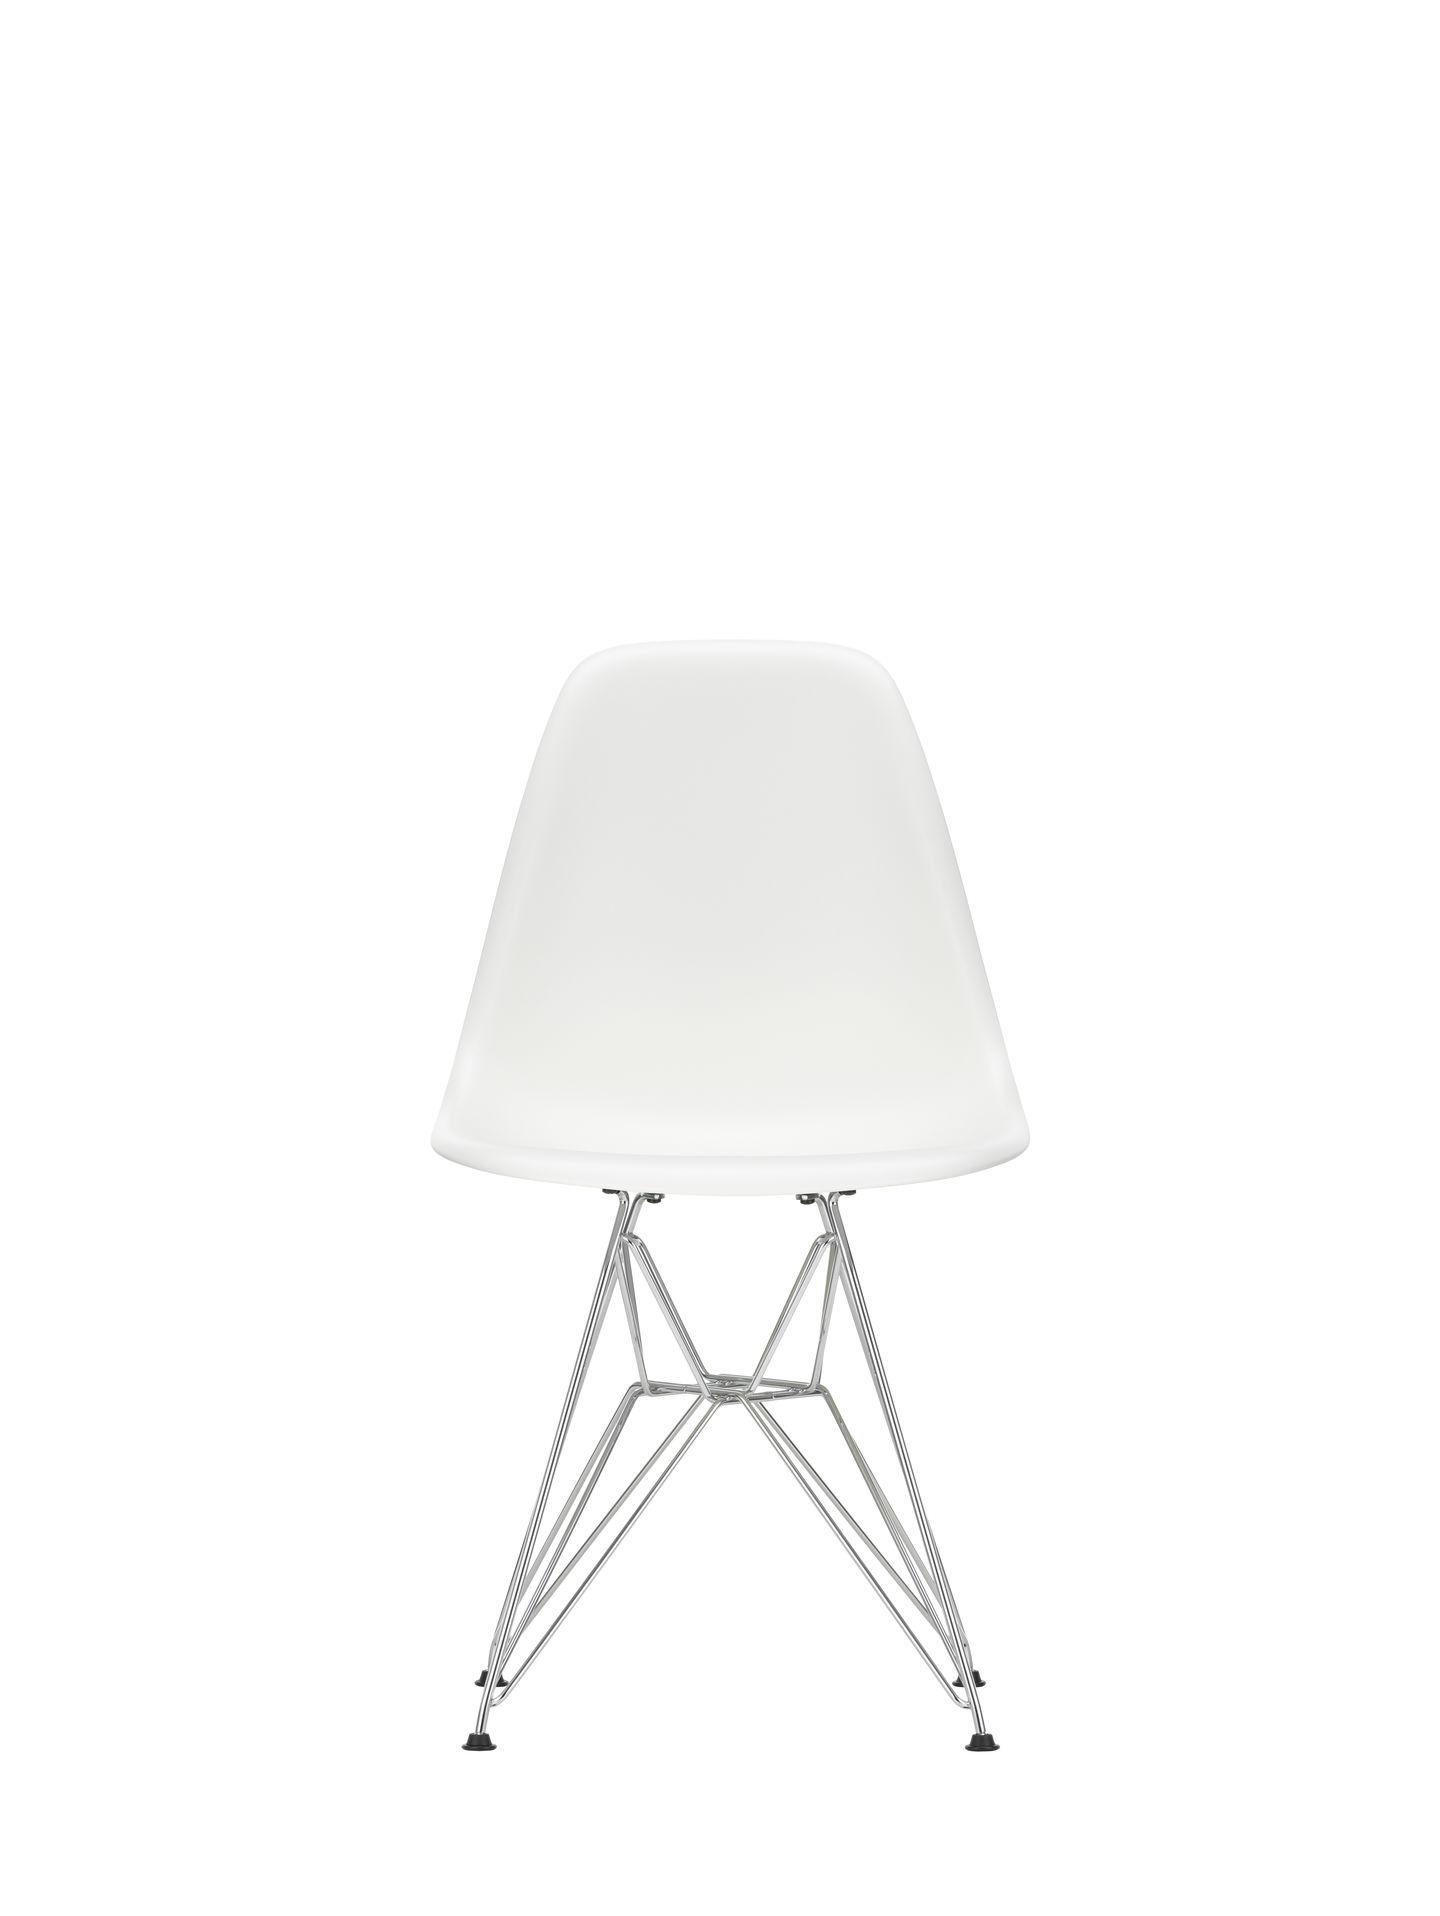 Vitra Eames Plastic Side Chair Dsr Charles Und Ray Eames White Quickship Designikonen Designmobel Shop